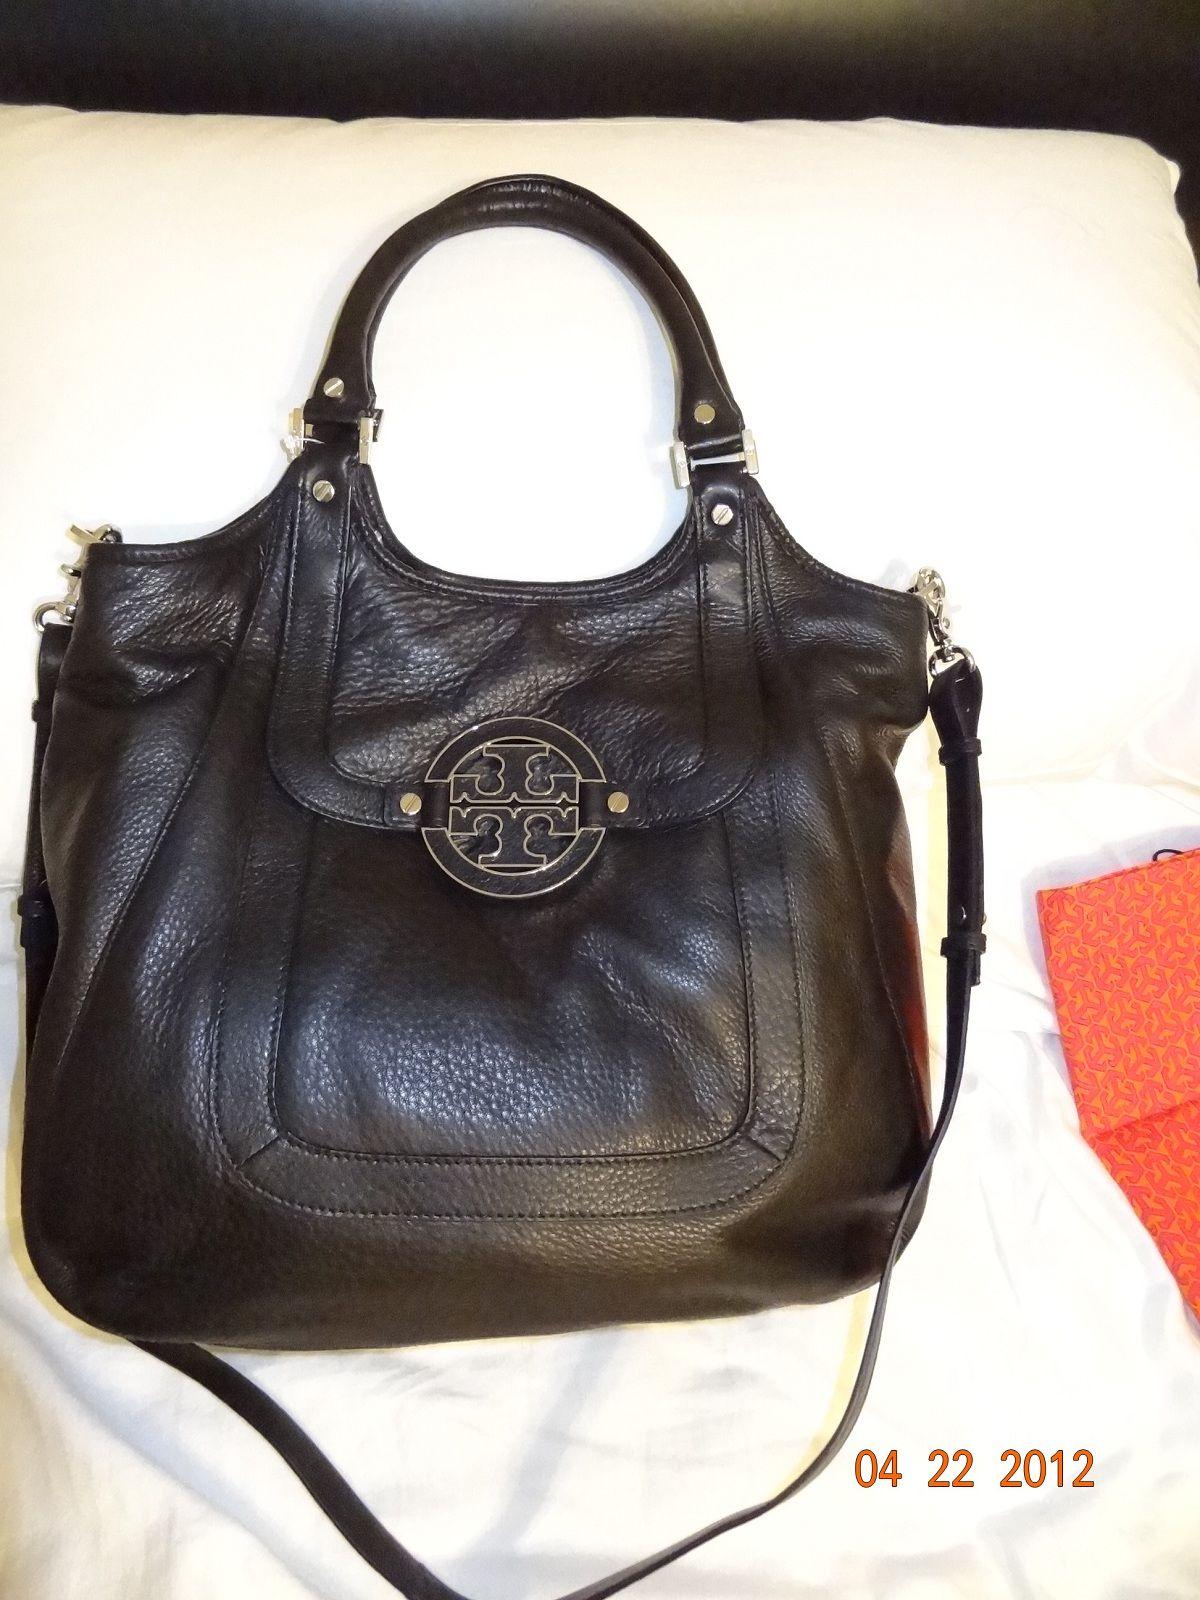 d232495826 Tory Burch bag! - PurseForum   My Style   Bags, Cheap gucci bags ...